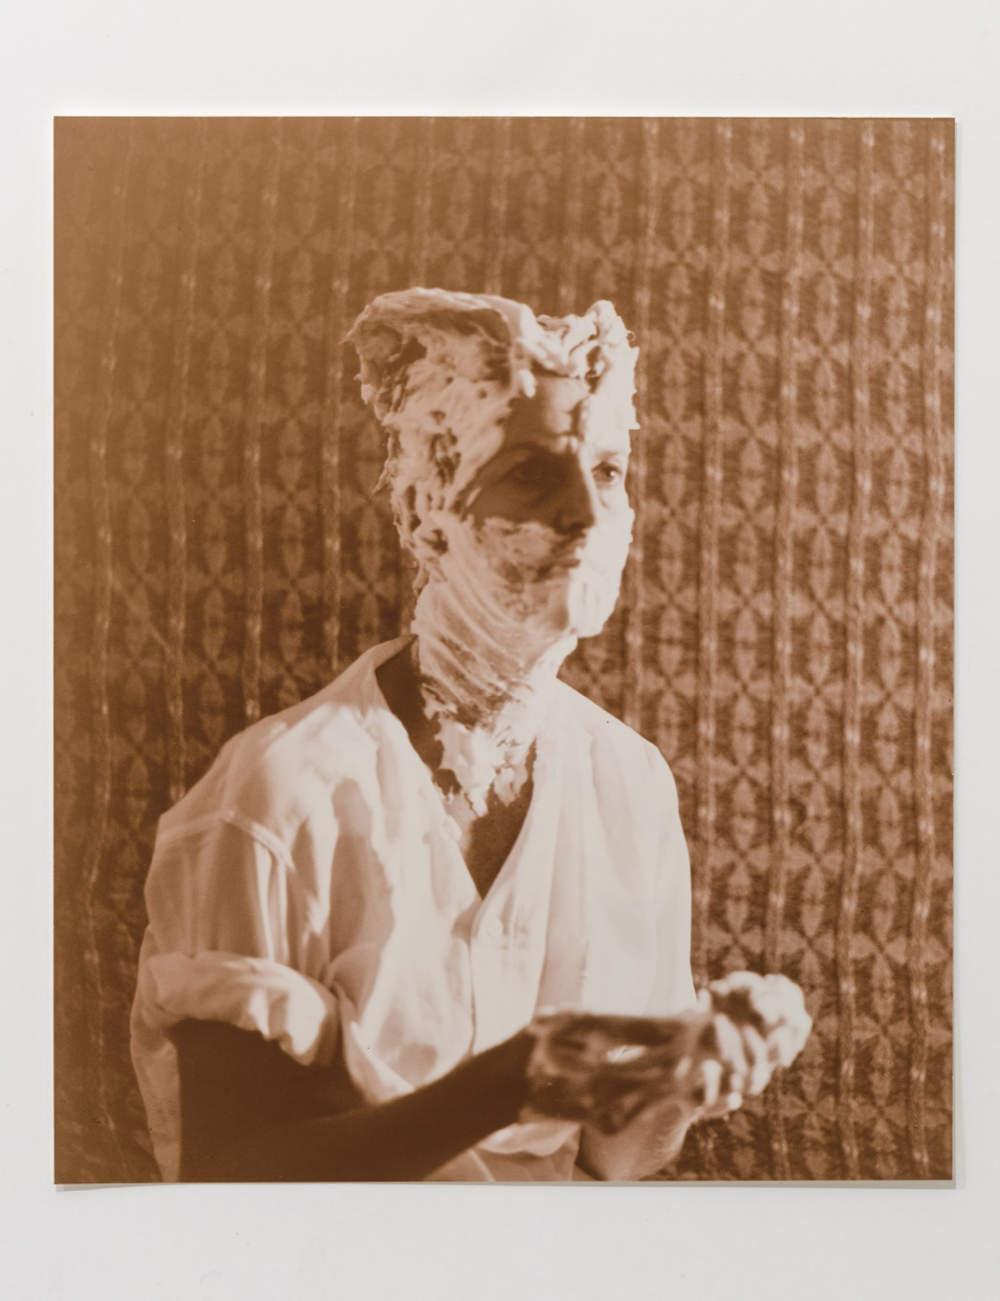 Sturtevant, Duchamp Man Ray. Photography 22,5 x 19,2 cm (8,86 x 7,56 in) 35,5 x 32,3 cm (13,98 x 12,72 in)